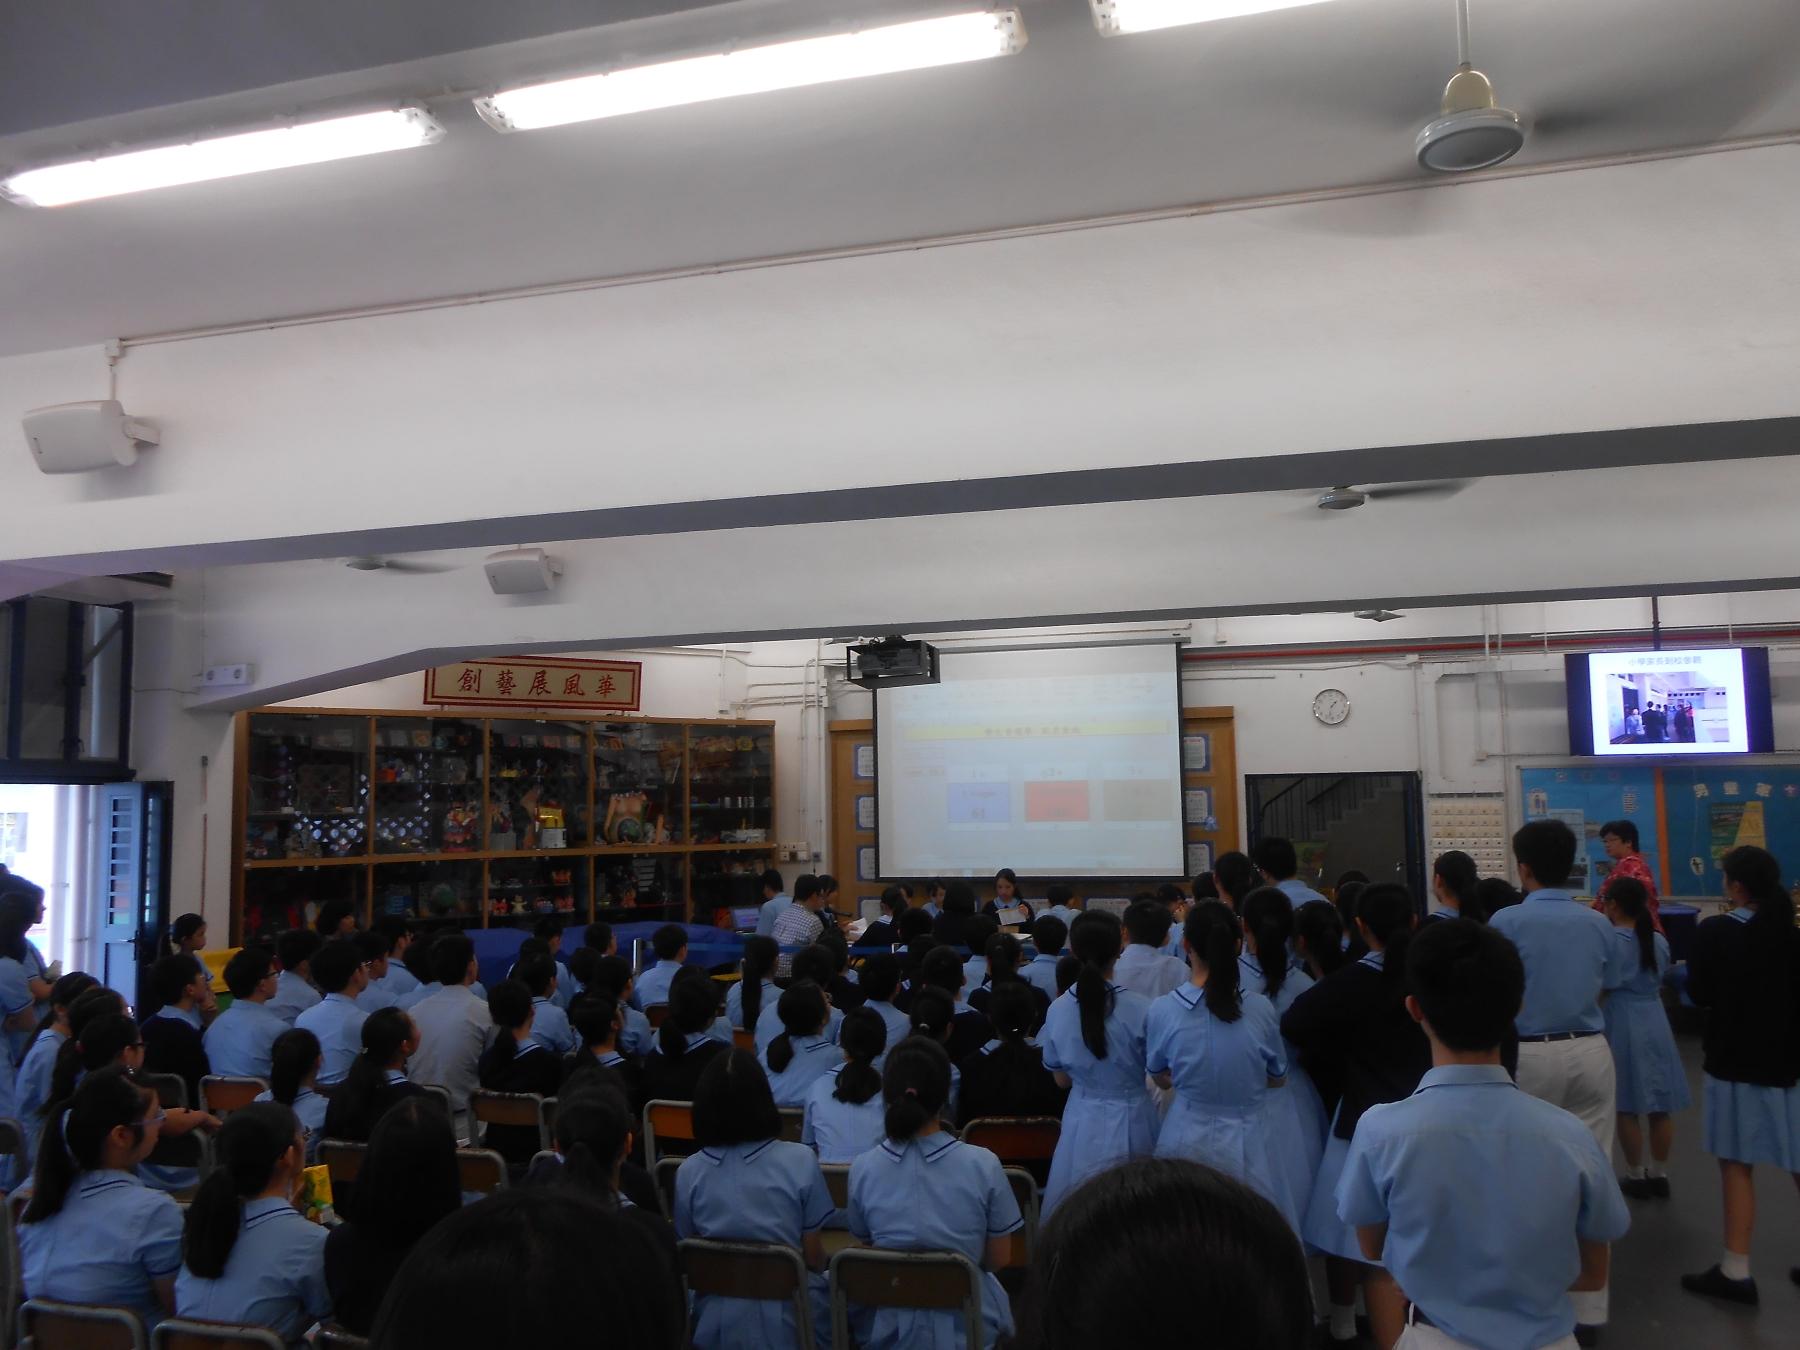 http://npc.edu.hk/sites/default/files/dscn2048.jpg